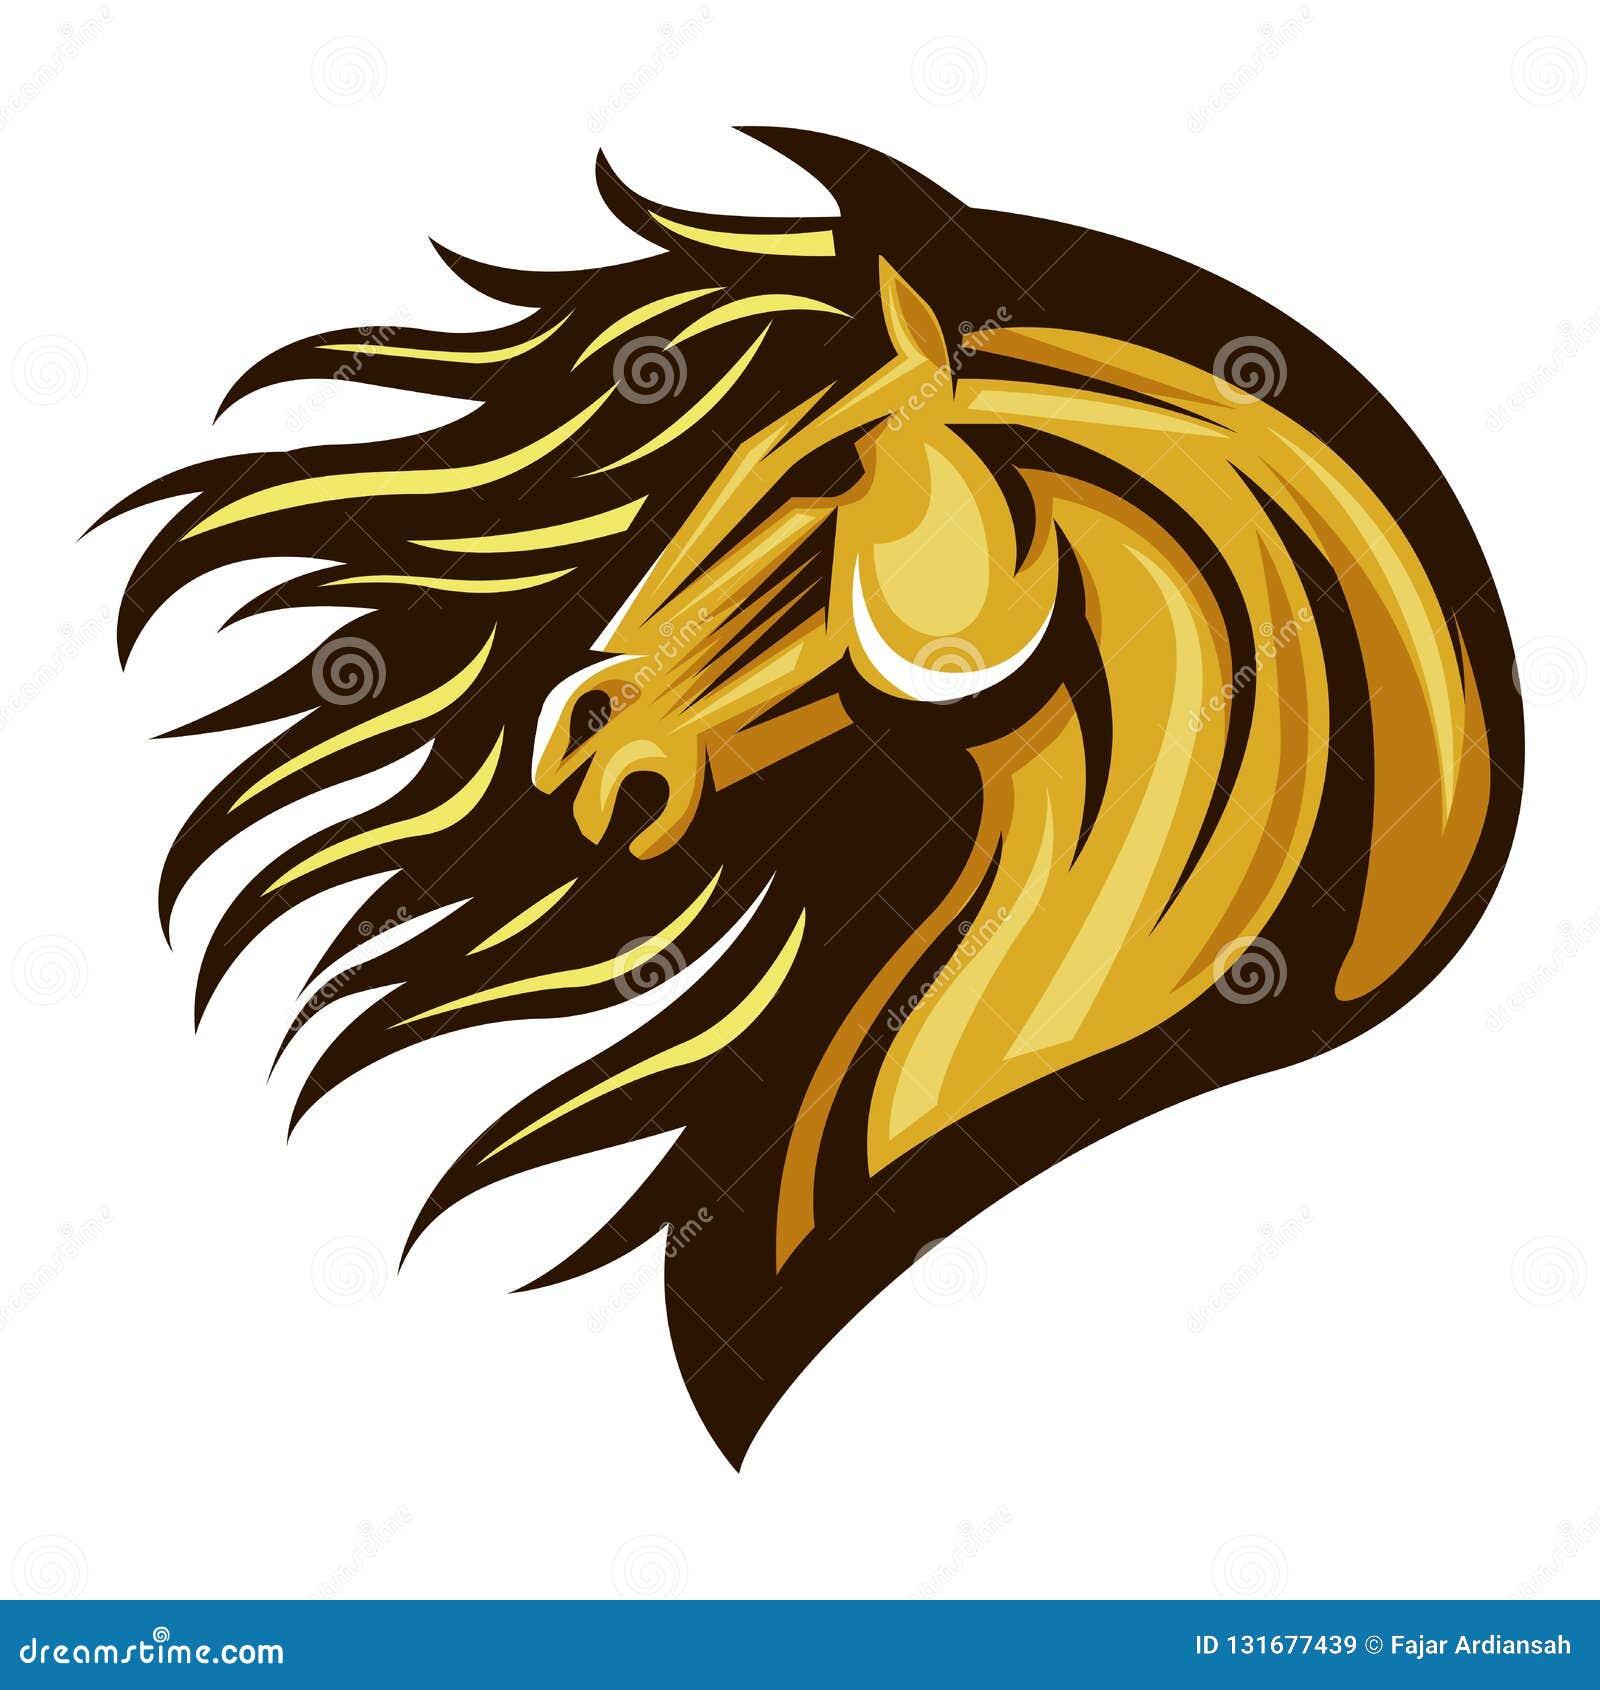 Horse Mascot Stock Illustrations – 7,910 Horse Mascot Stock Illustrations,  Vectors & Clipart - Dreamstime